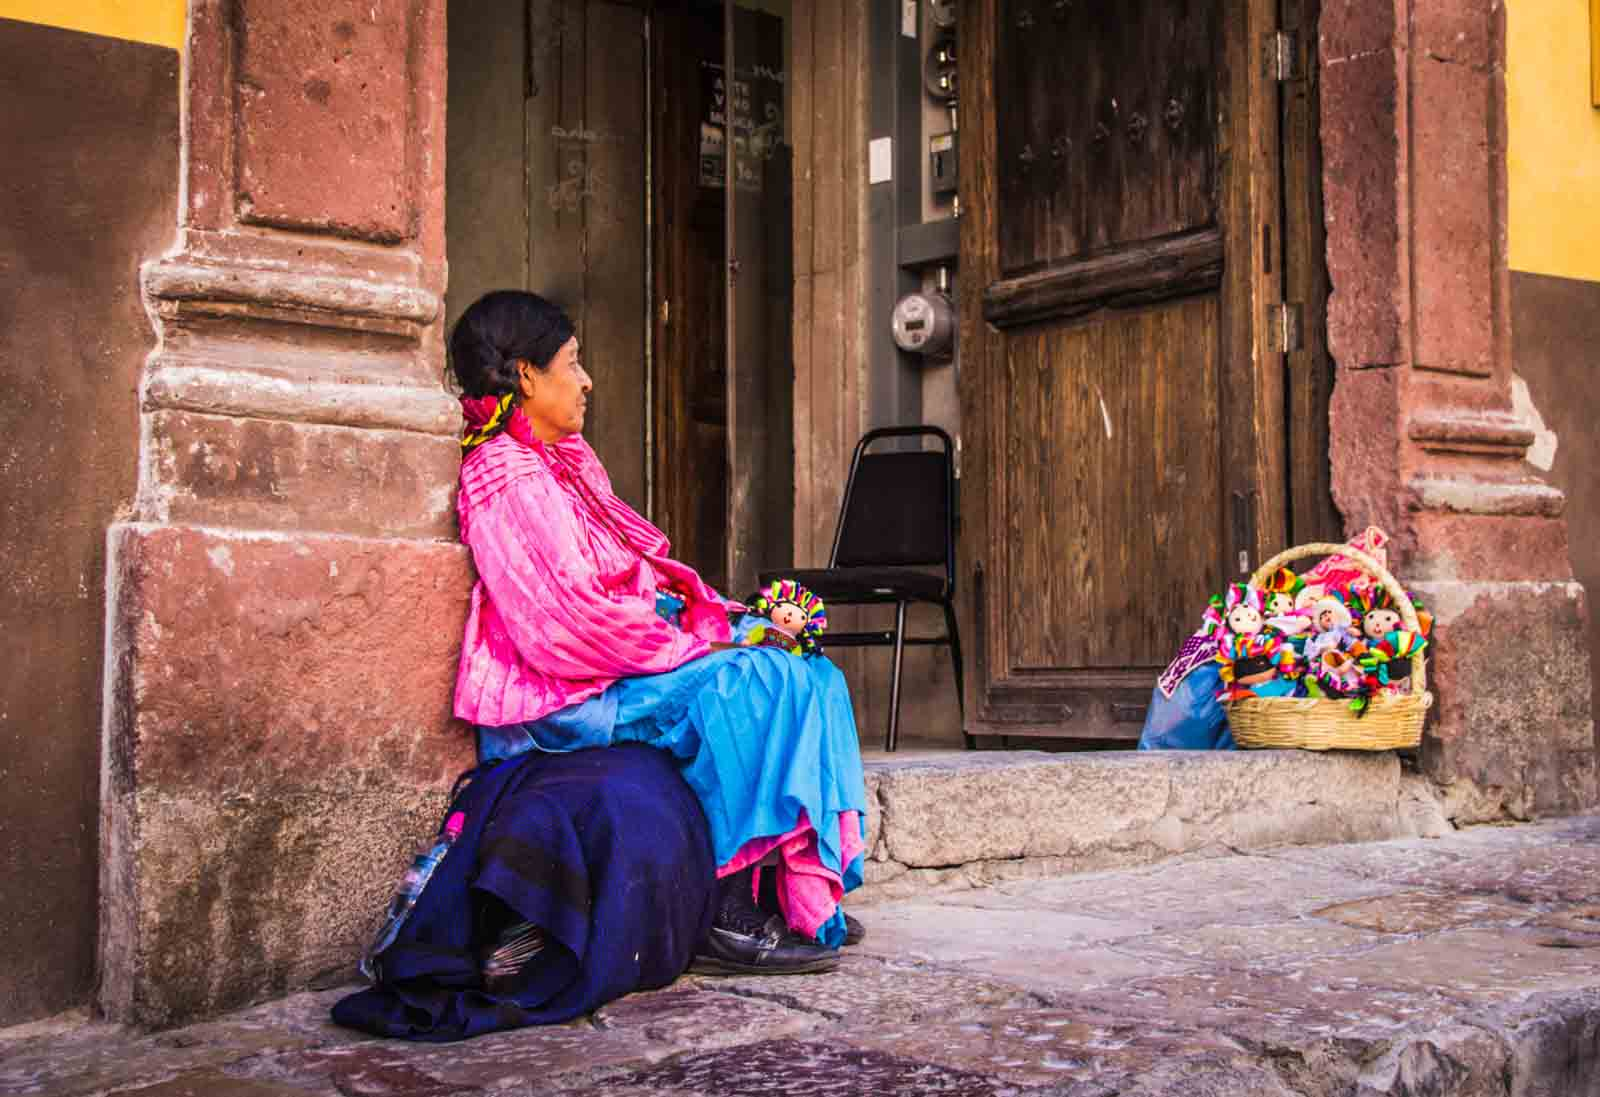 nahuatl-mexico-bernardo-ramonfaur-unsplash